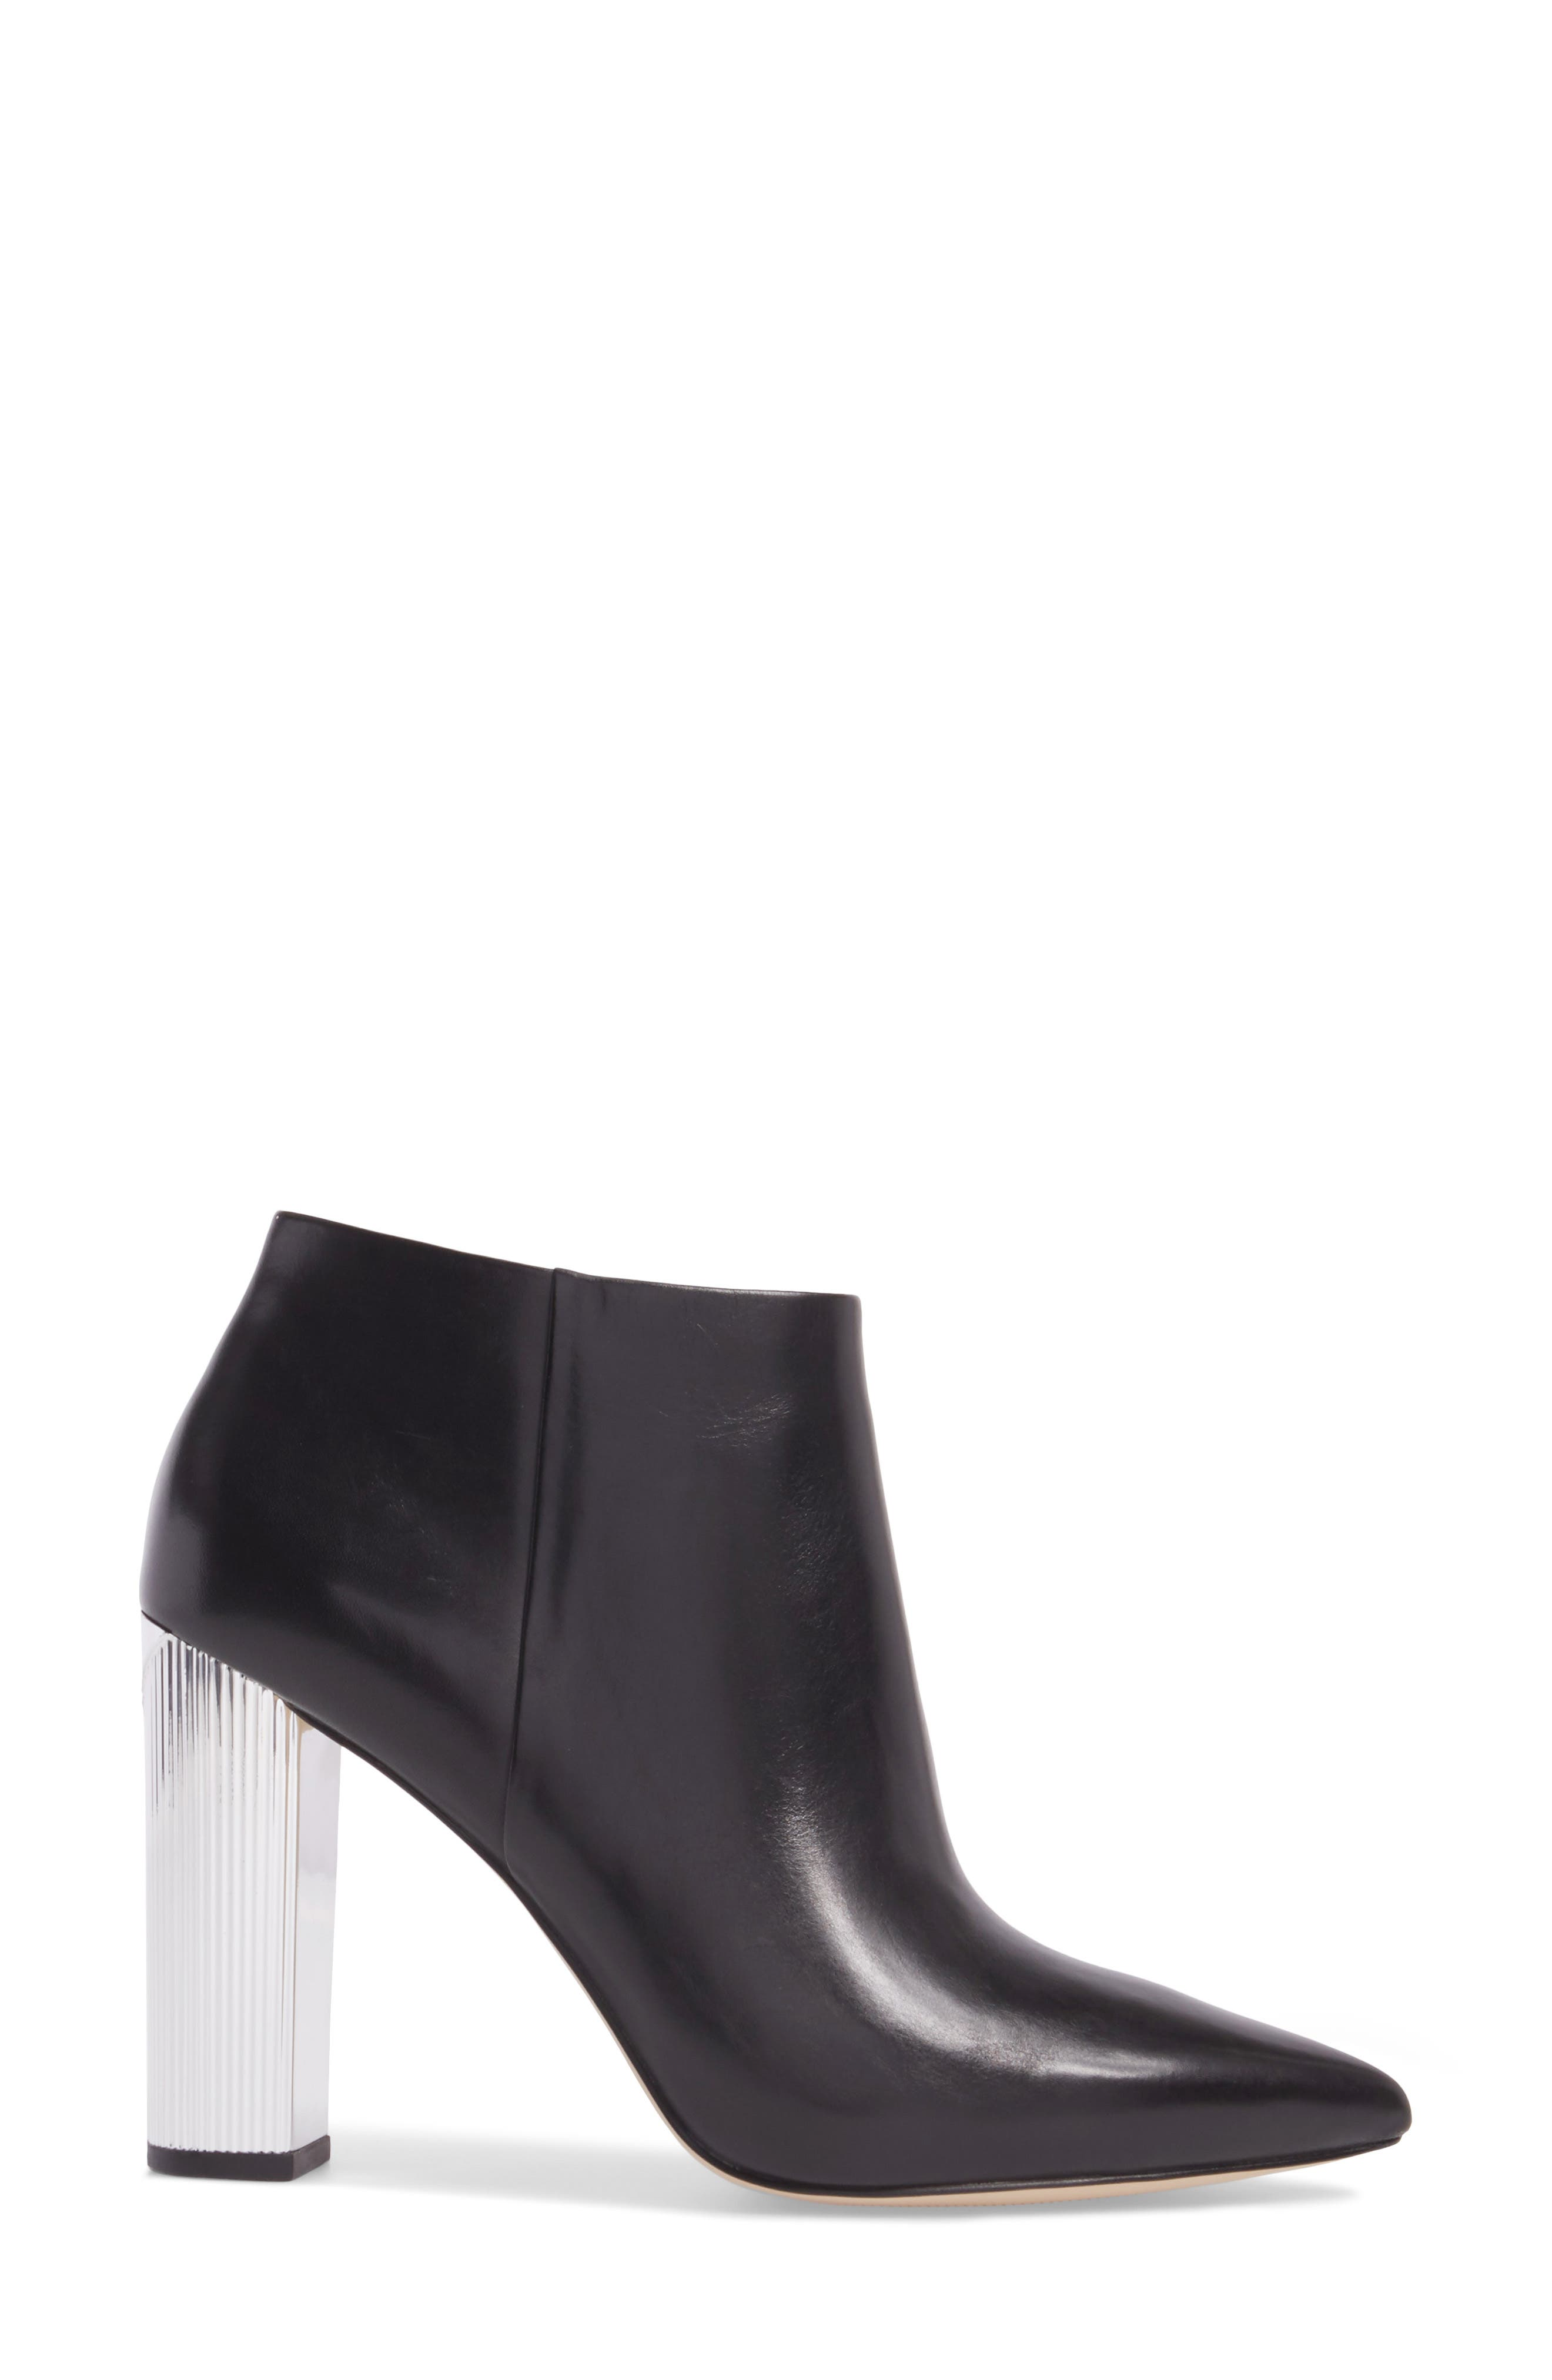 Paloma Bootie,                             Alternate thumbnail 3, color,                             Black Calf Leather